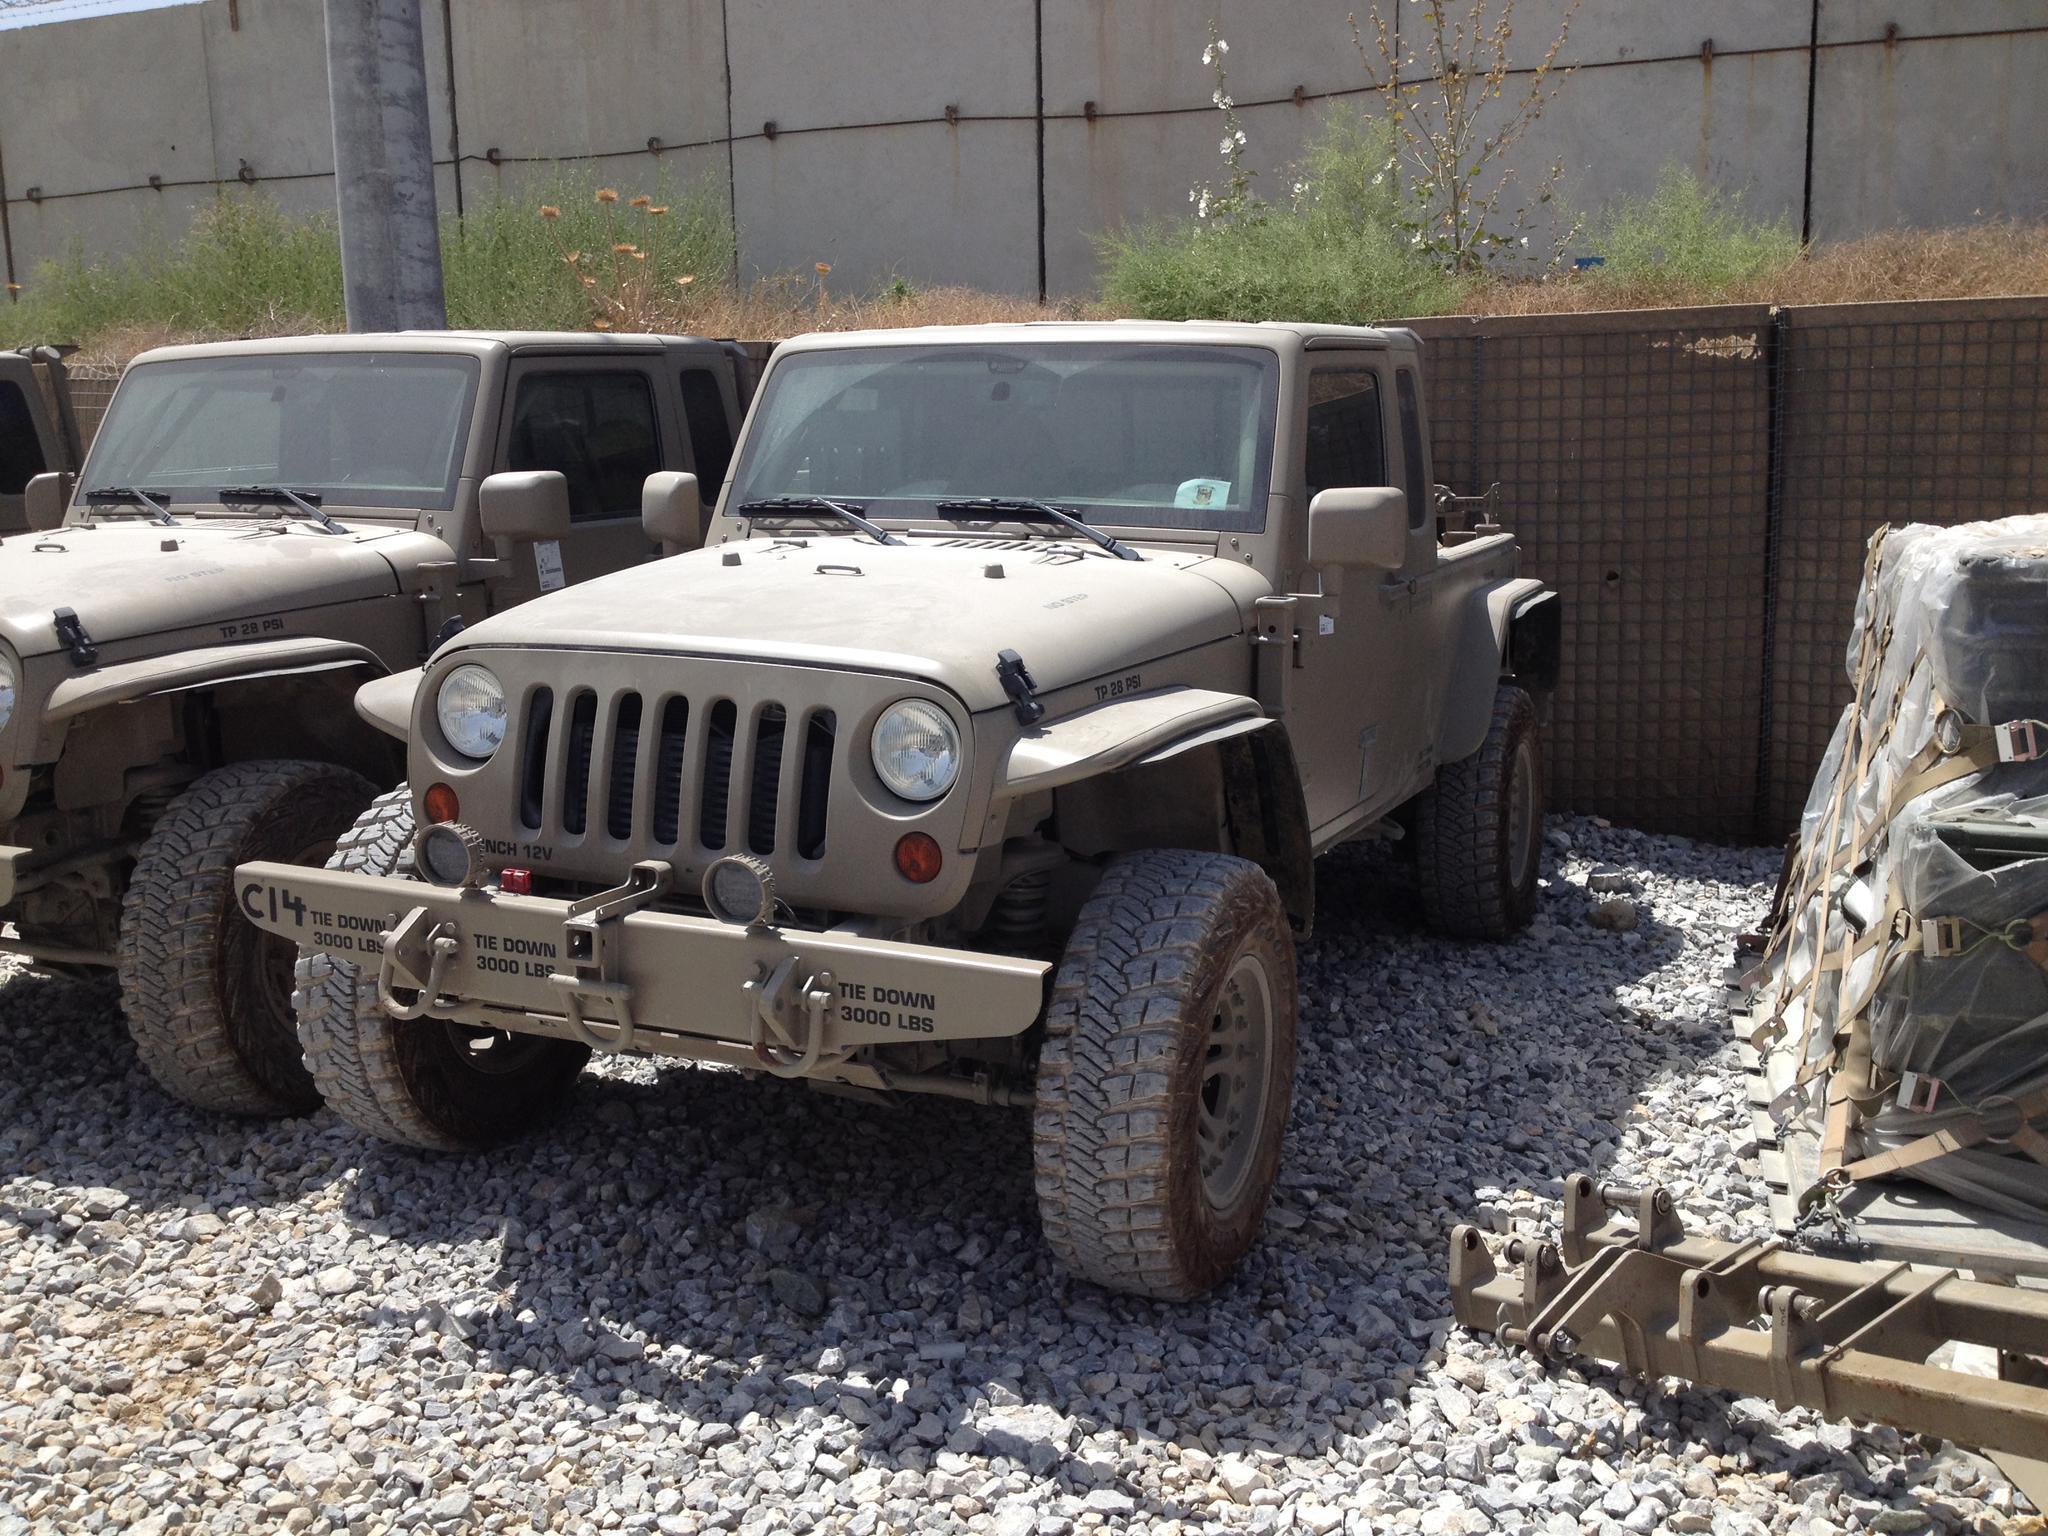 2017 jeep wrangler pickup page 6 toyota fj cruiser forum. Black Bedroom Furniture Sets. Home Design Ideas